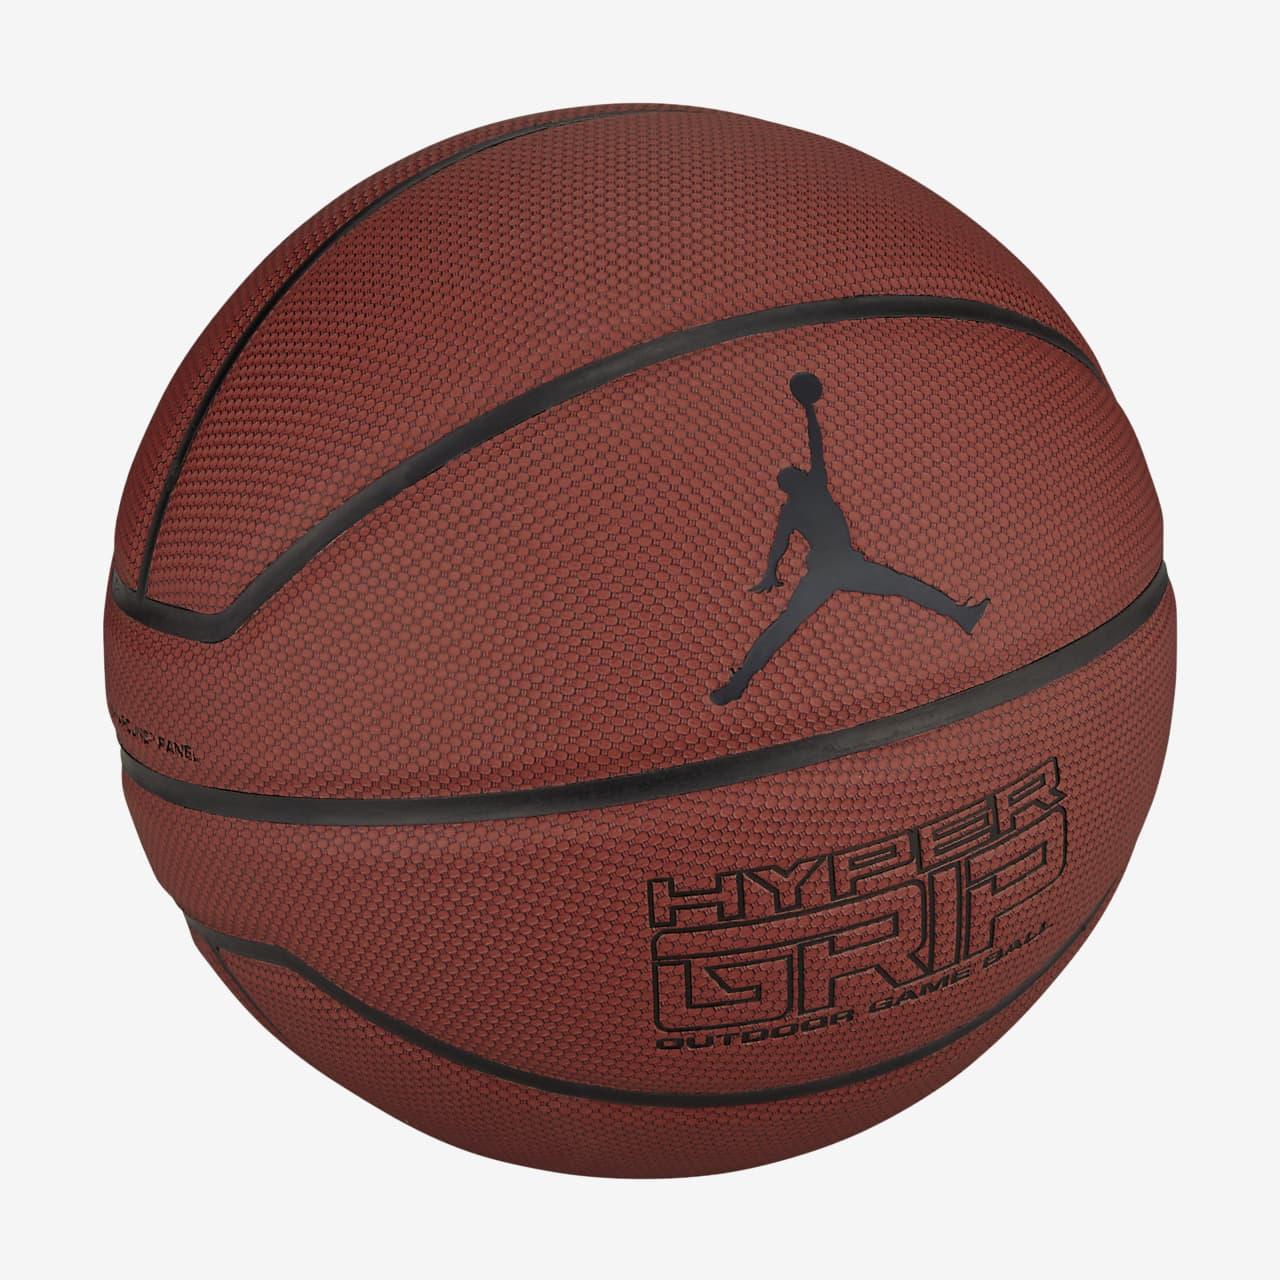 Basketbalový míč Jordan HyperGrip 4P